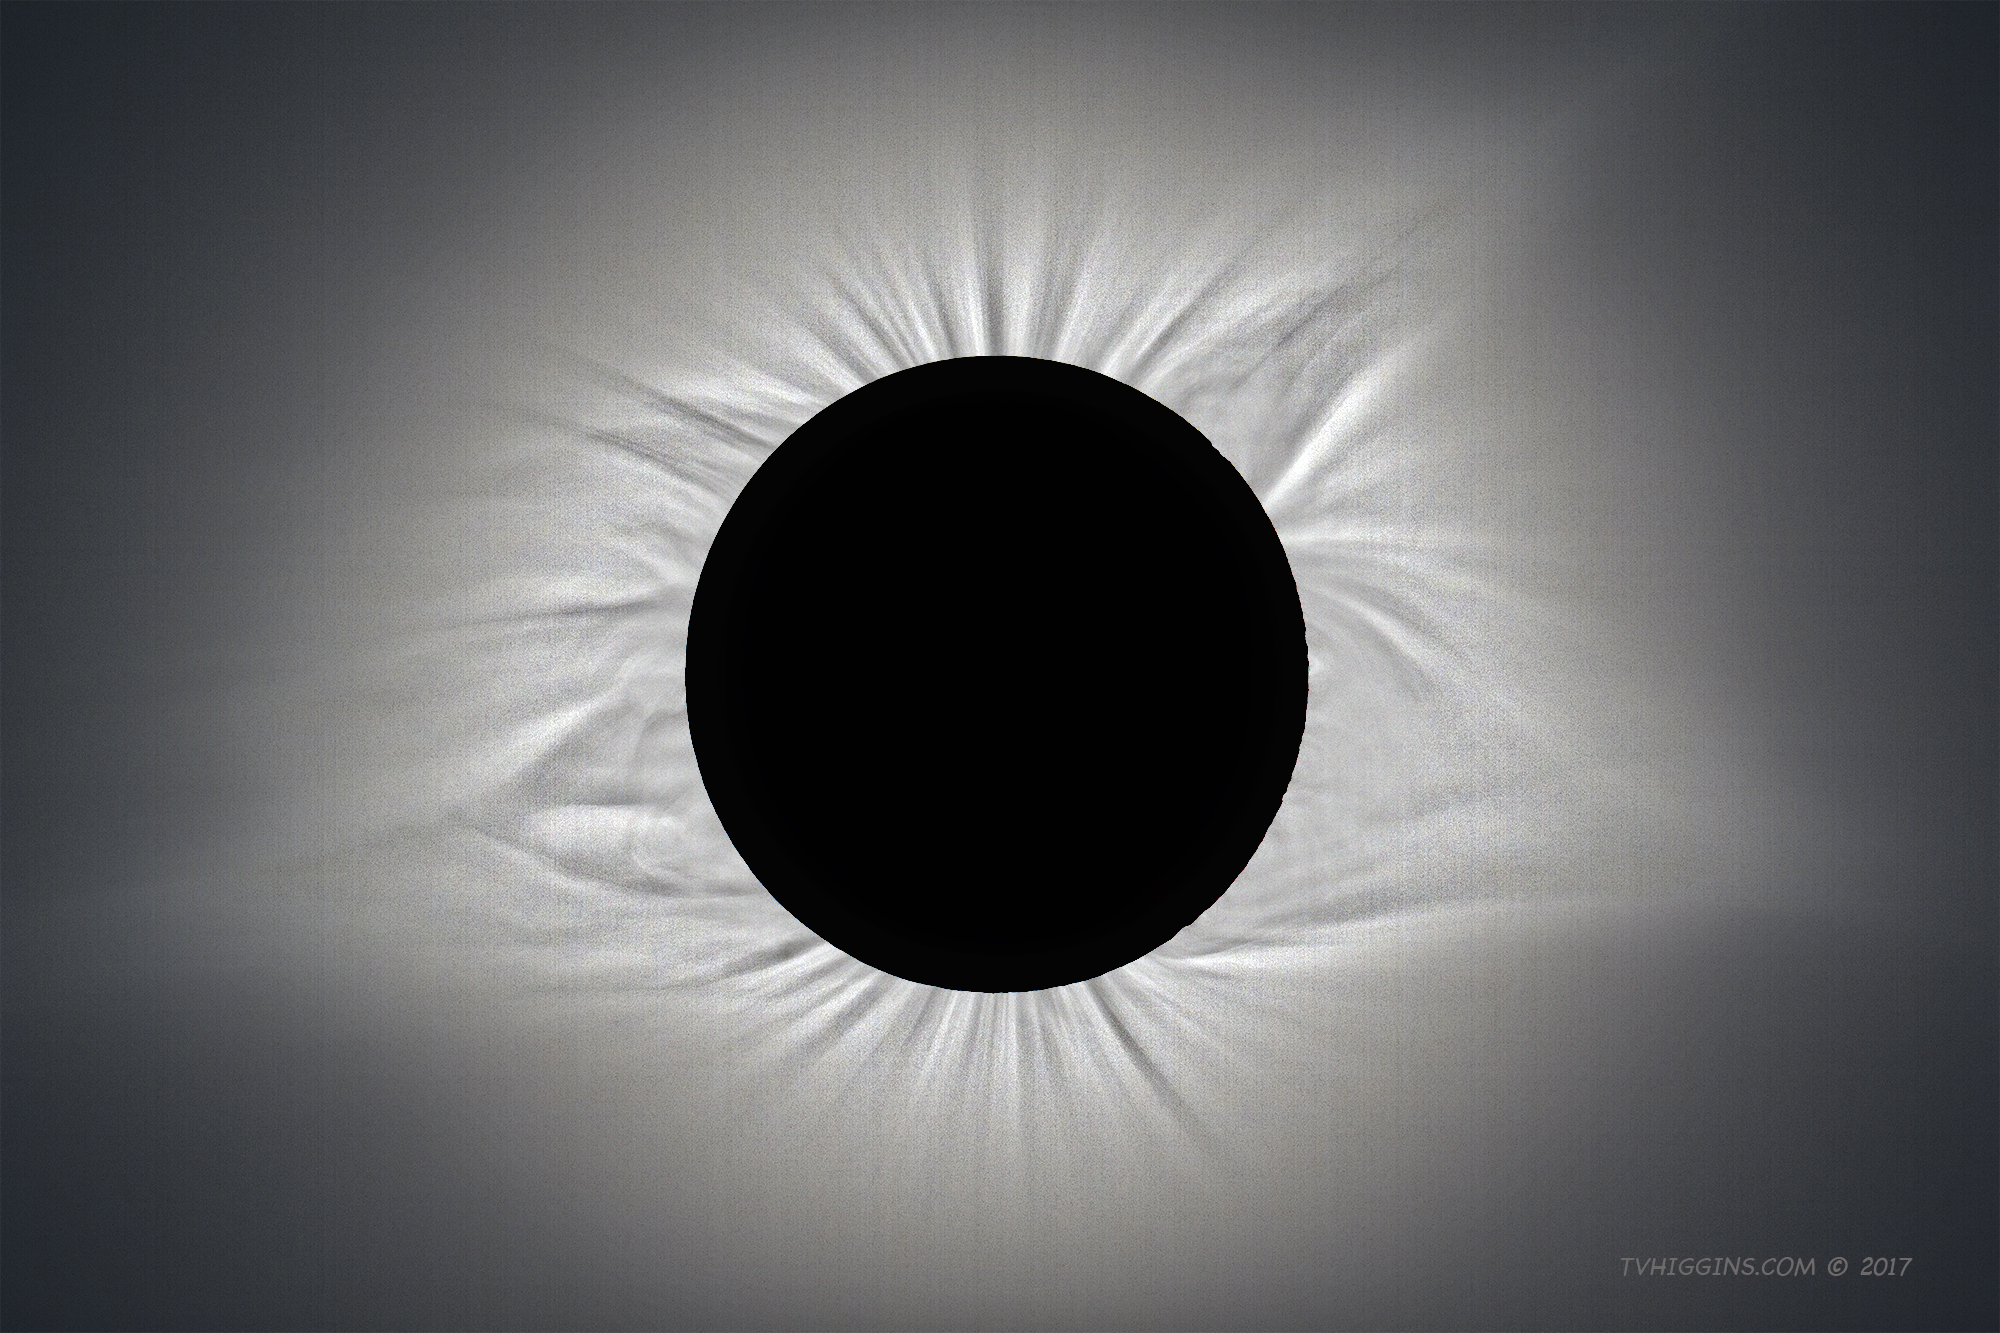 Coronal Study, 2017 Solar Eclipse